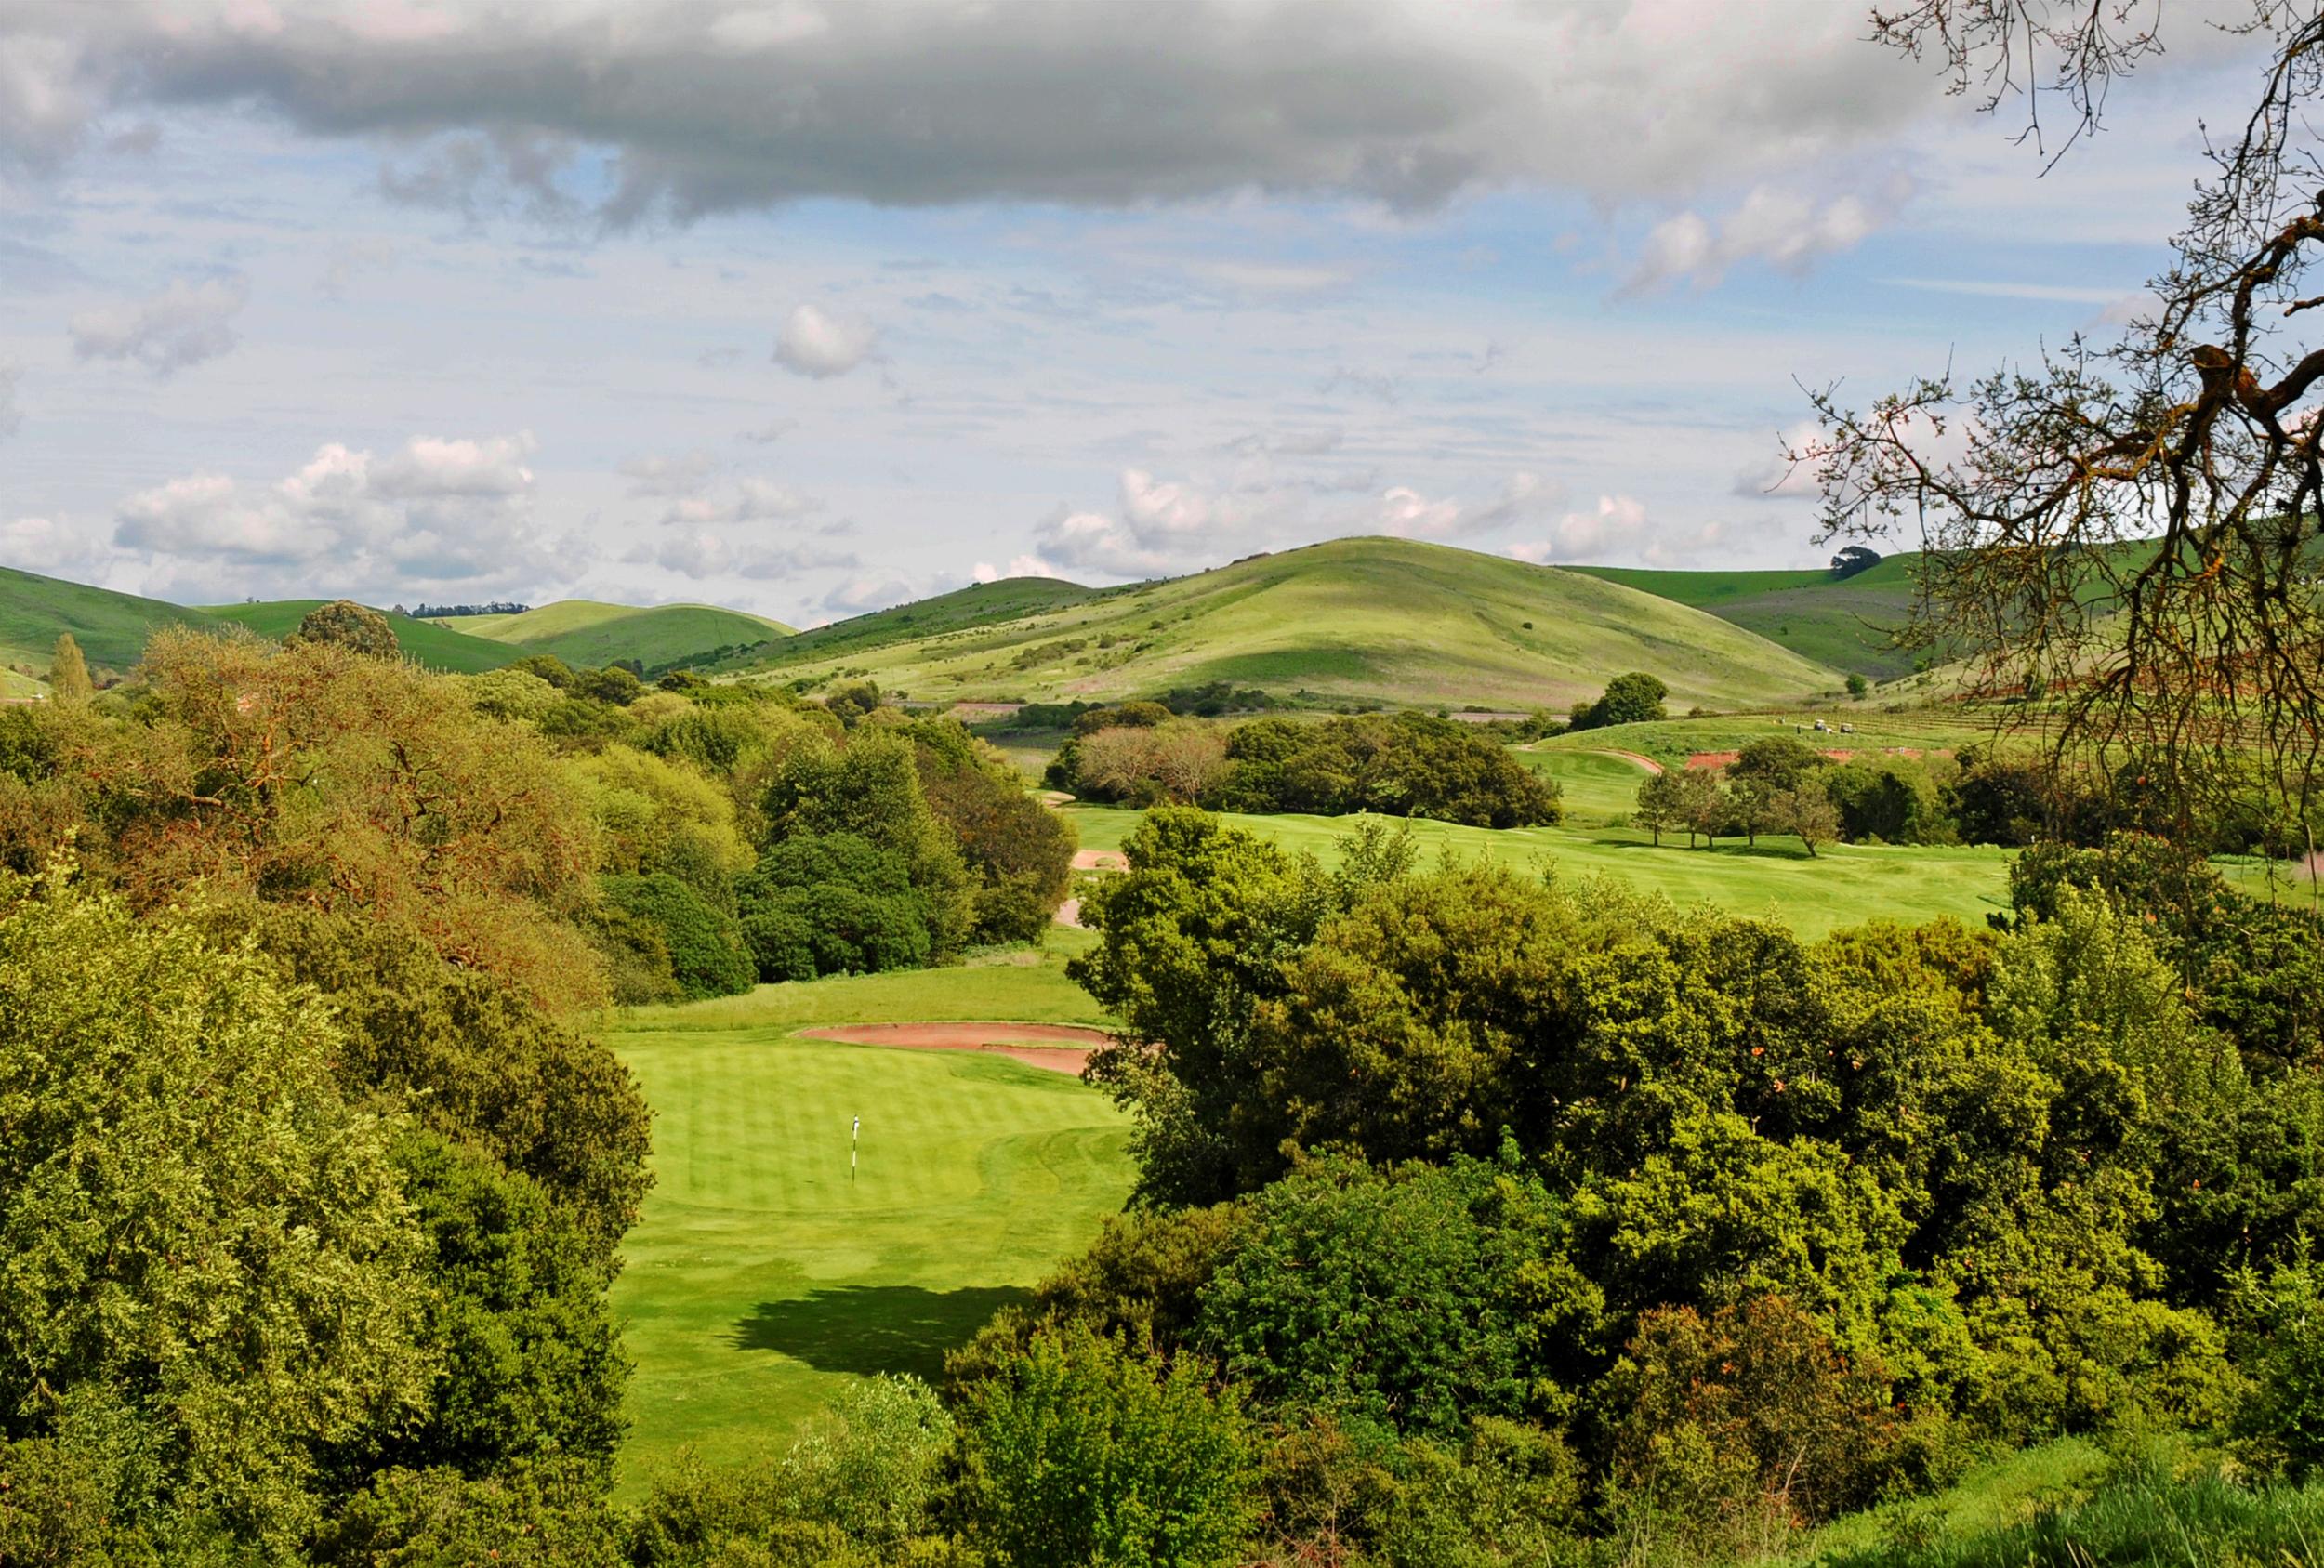 Tee box at the downhill par-3, 16th provides a dramatic landscape view © Robert Kaufman